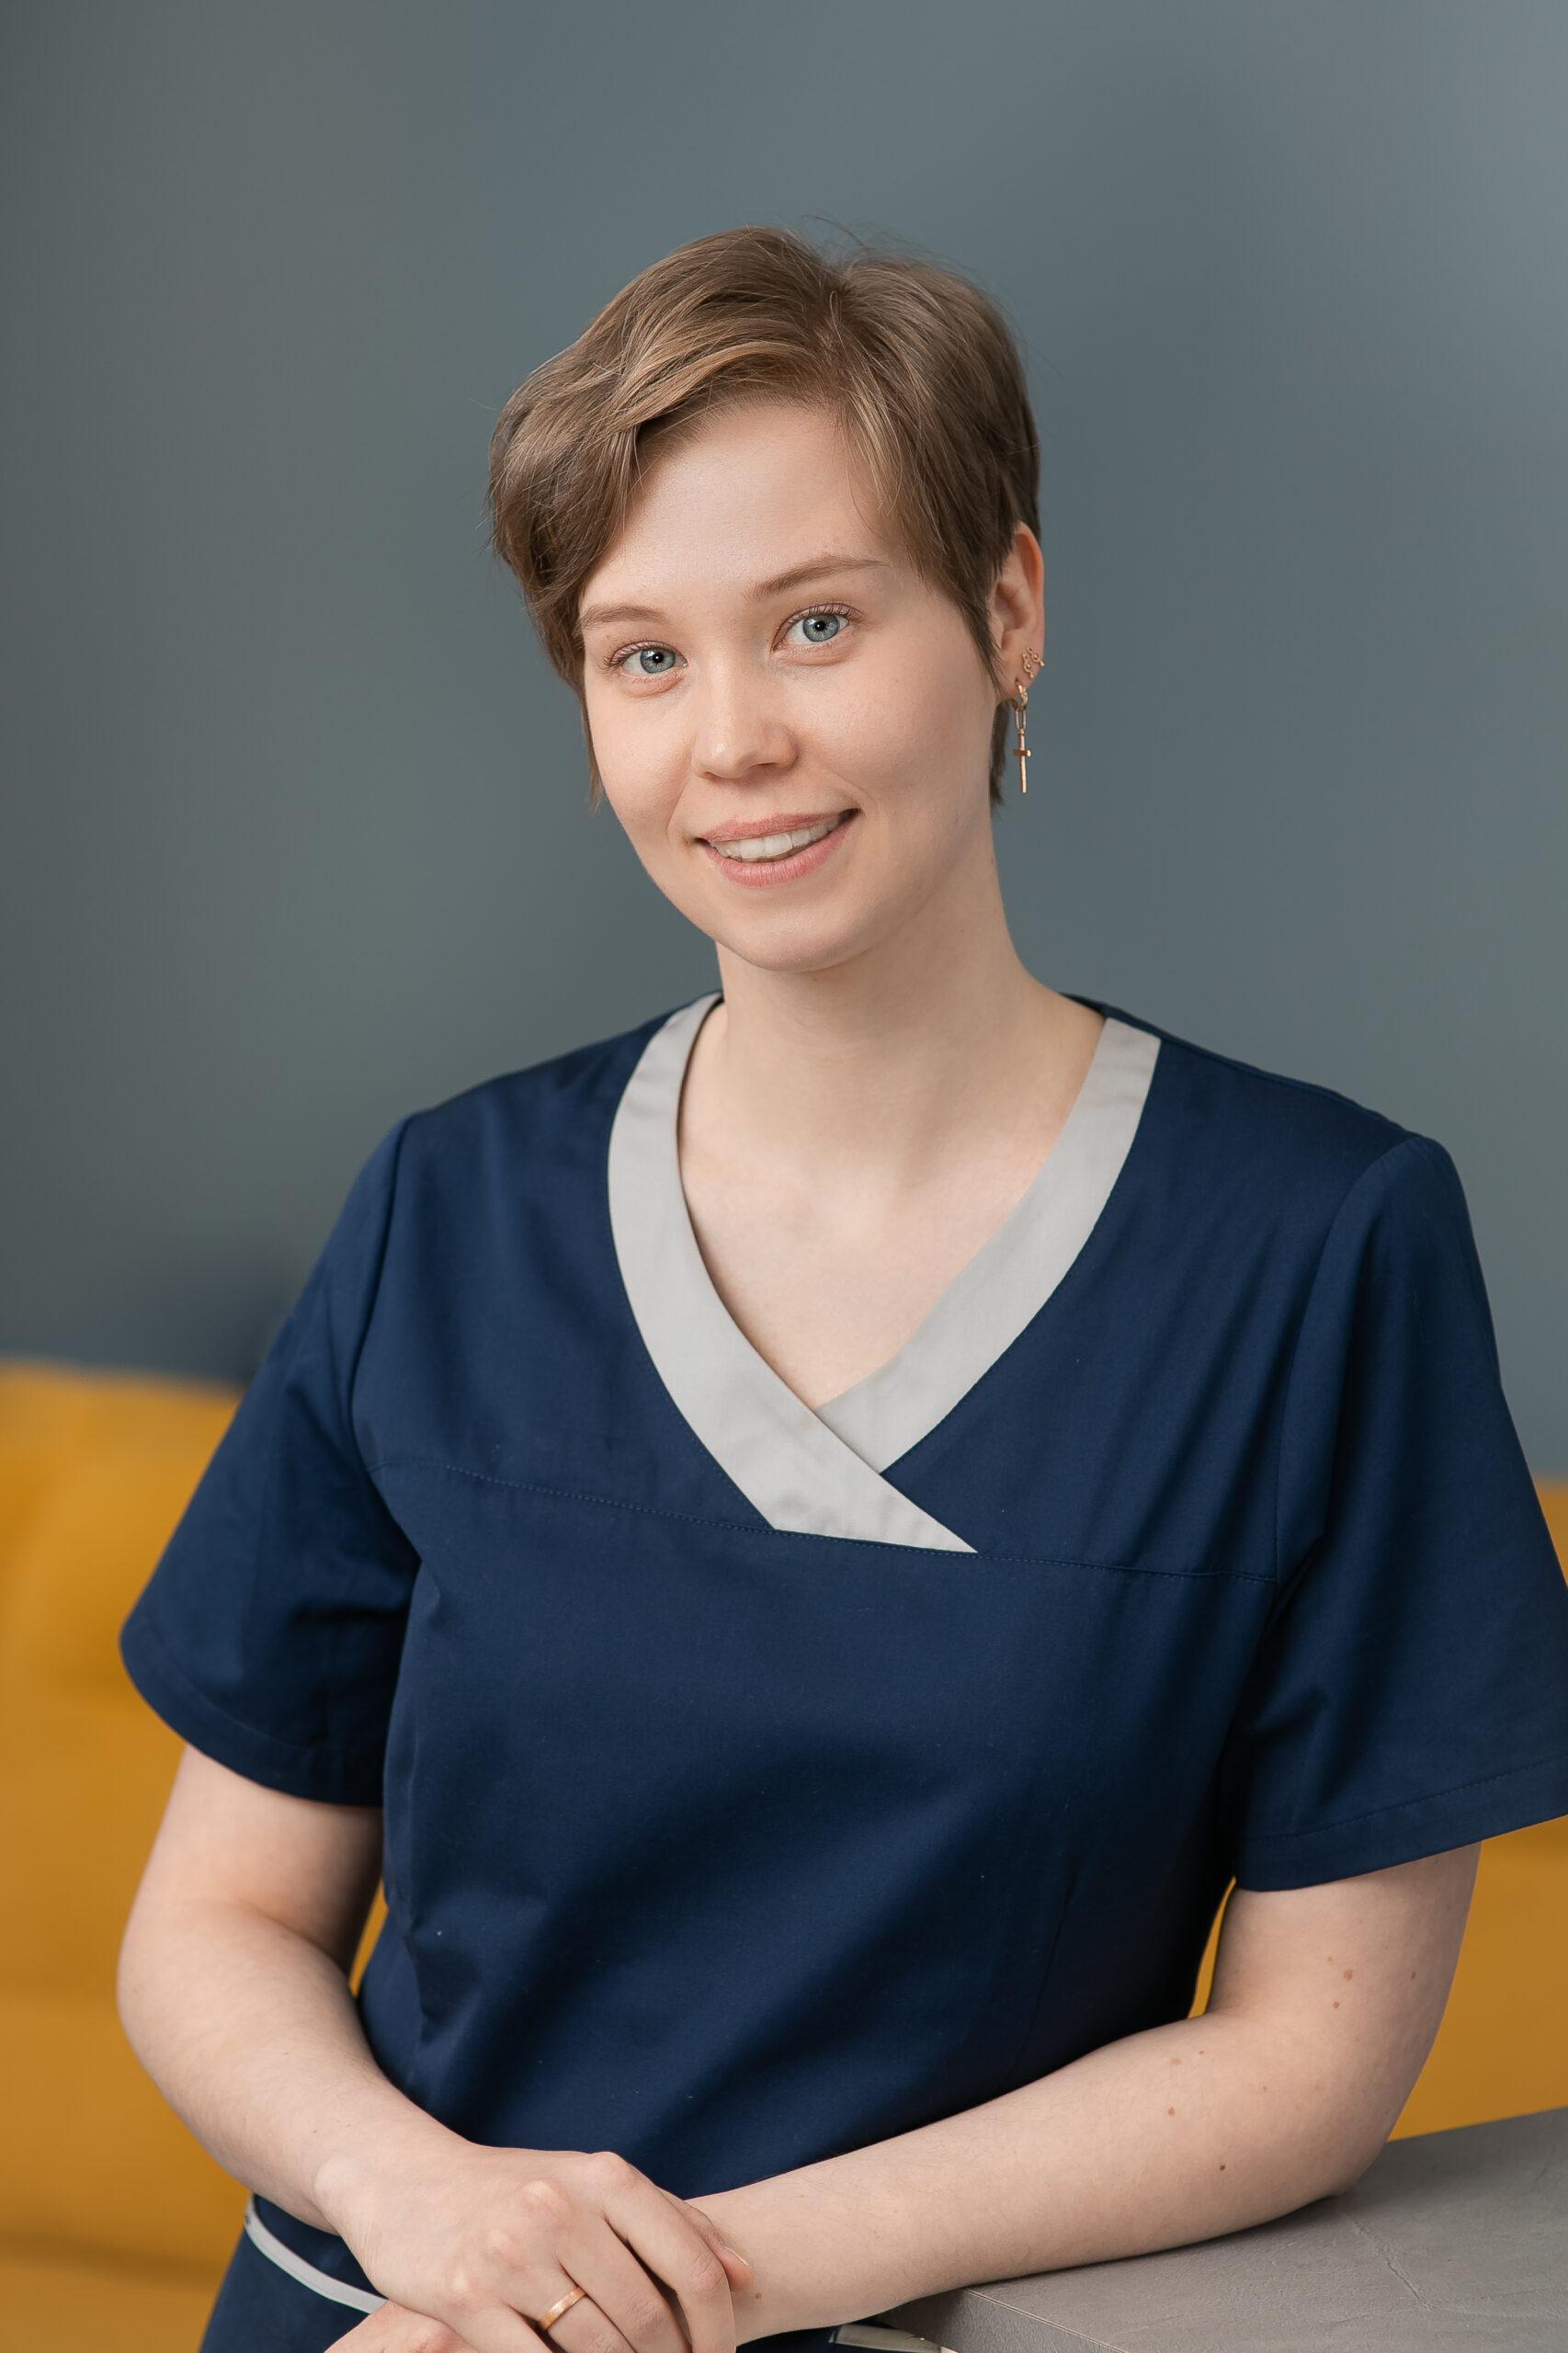 Dr. Julia Smirnova